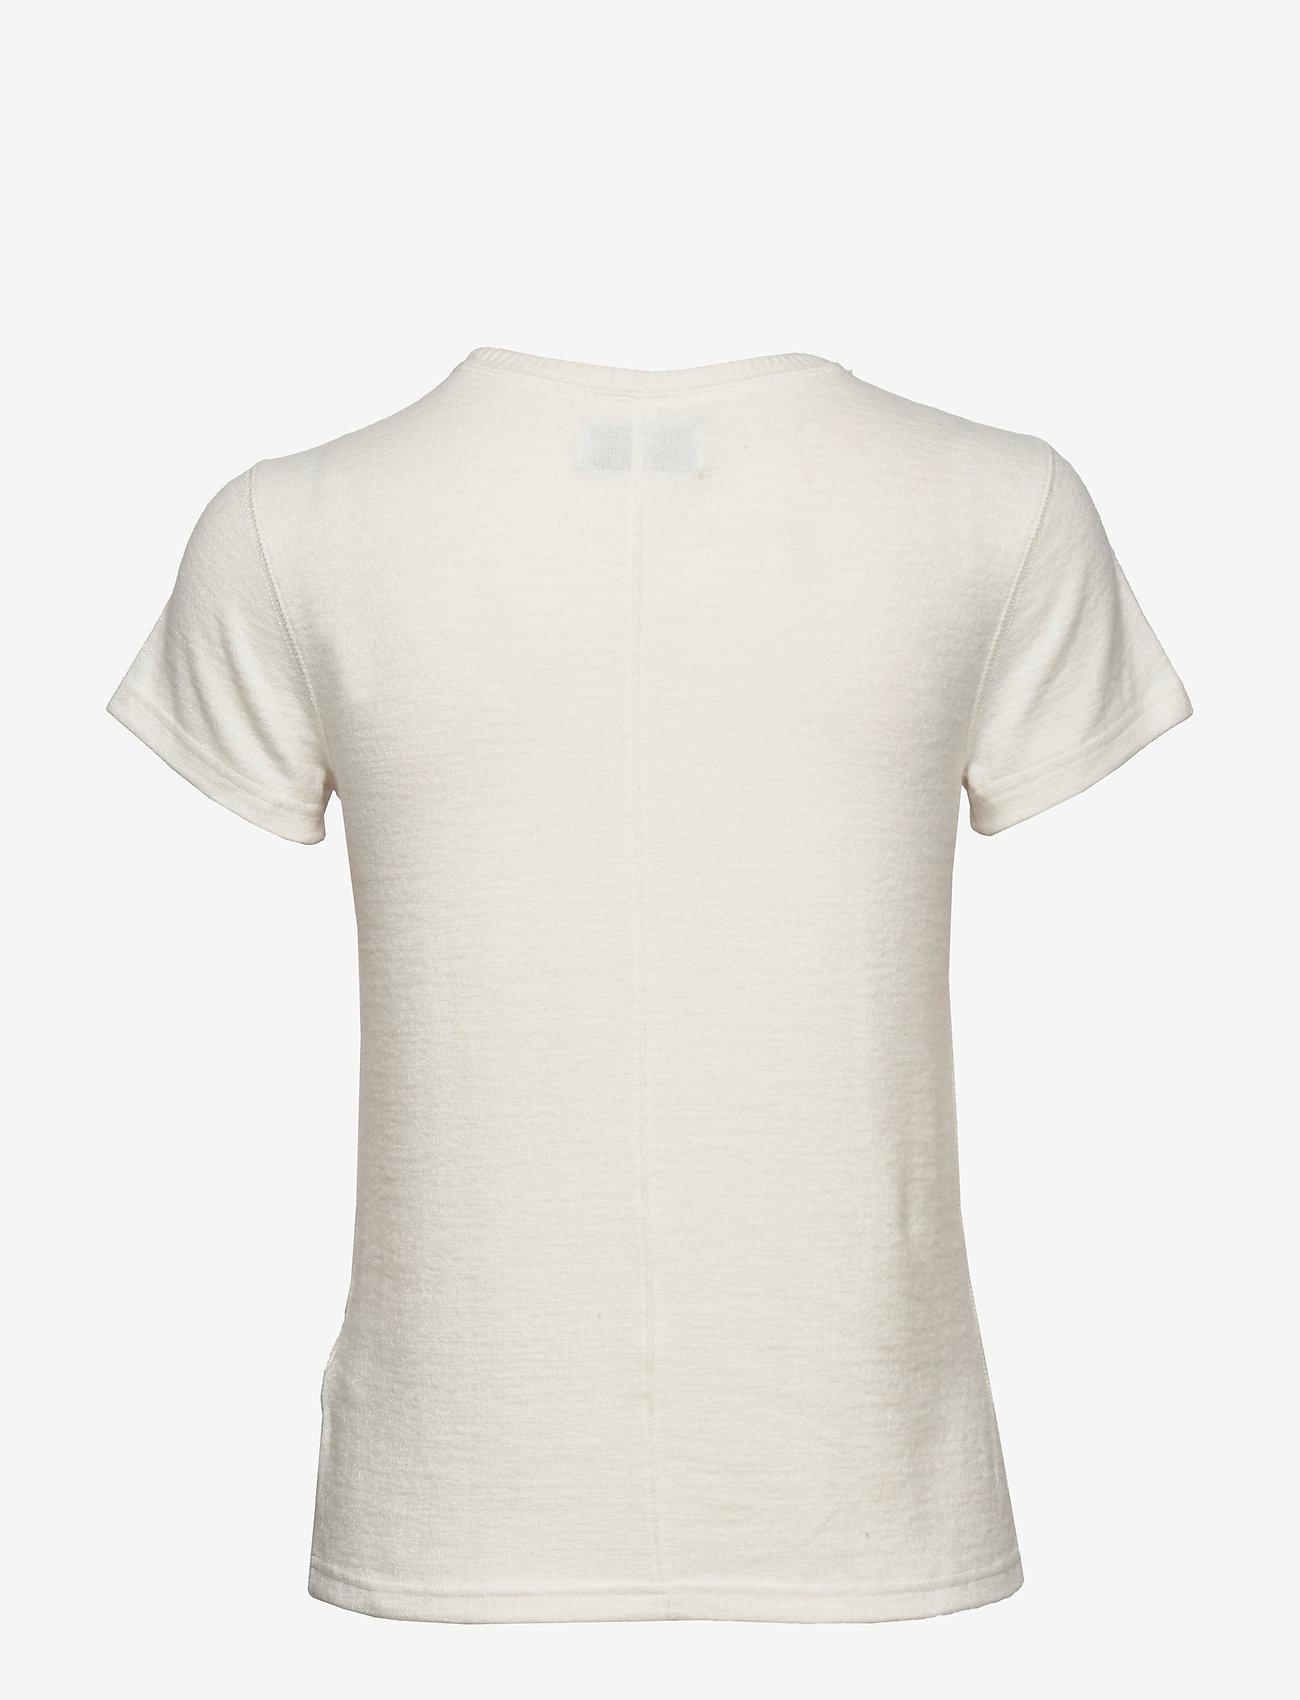 Cozy Logo Tee (White) (529 kr) - Abercrombie & Fitch